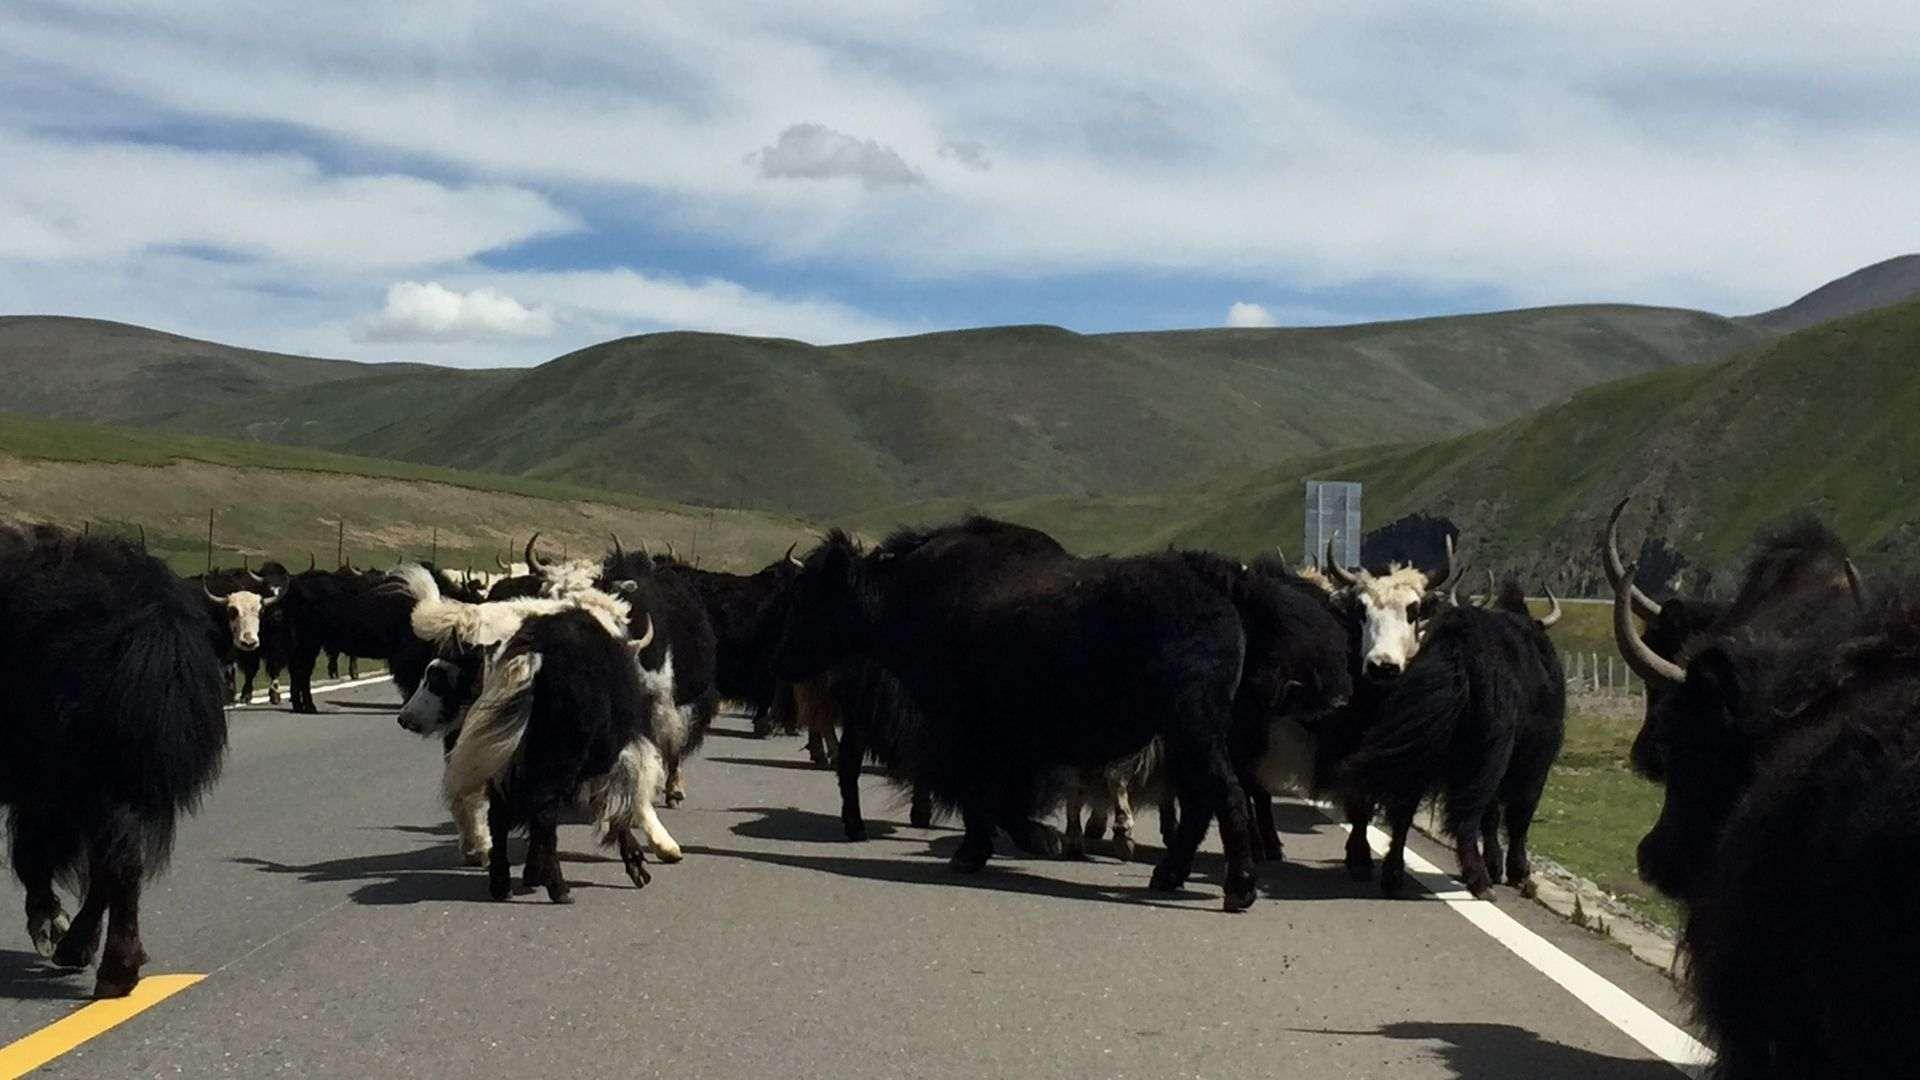 Yaks on the road in Qinghai Province, Eastern Tibet